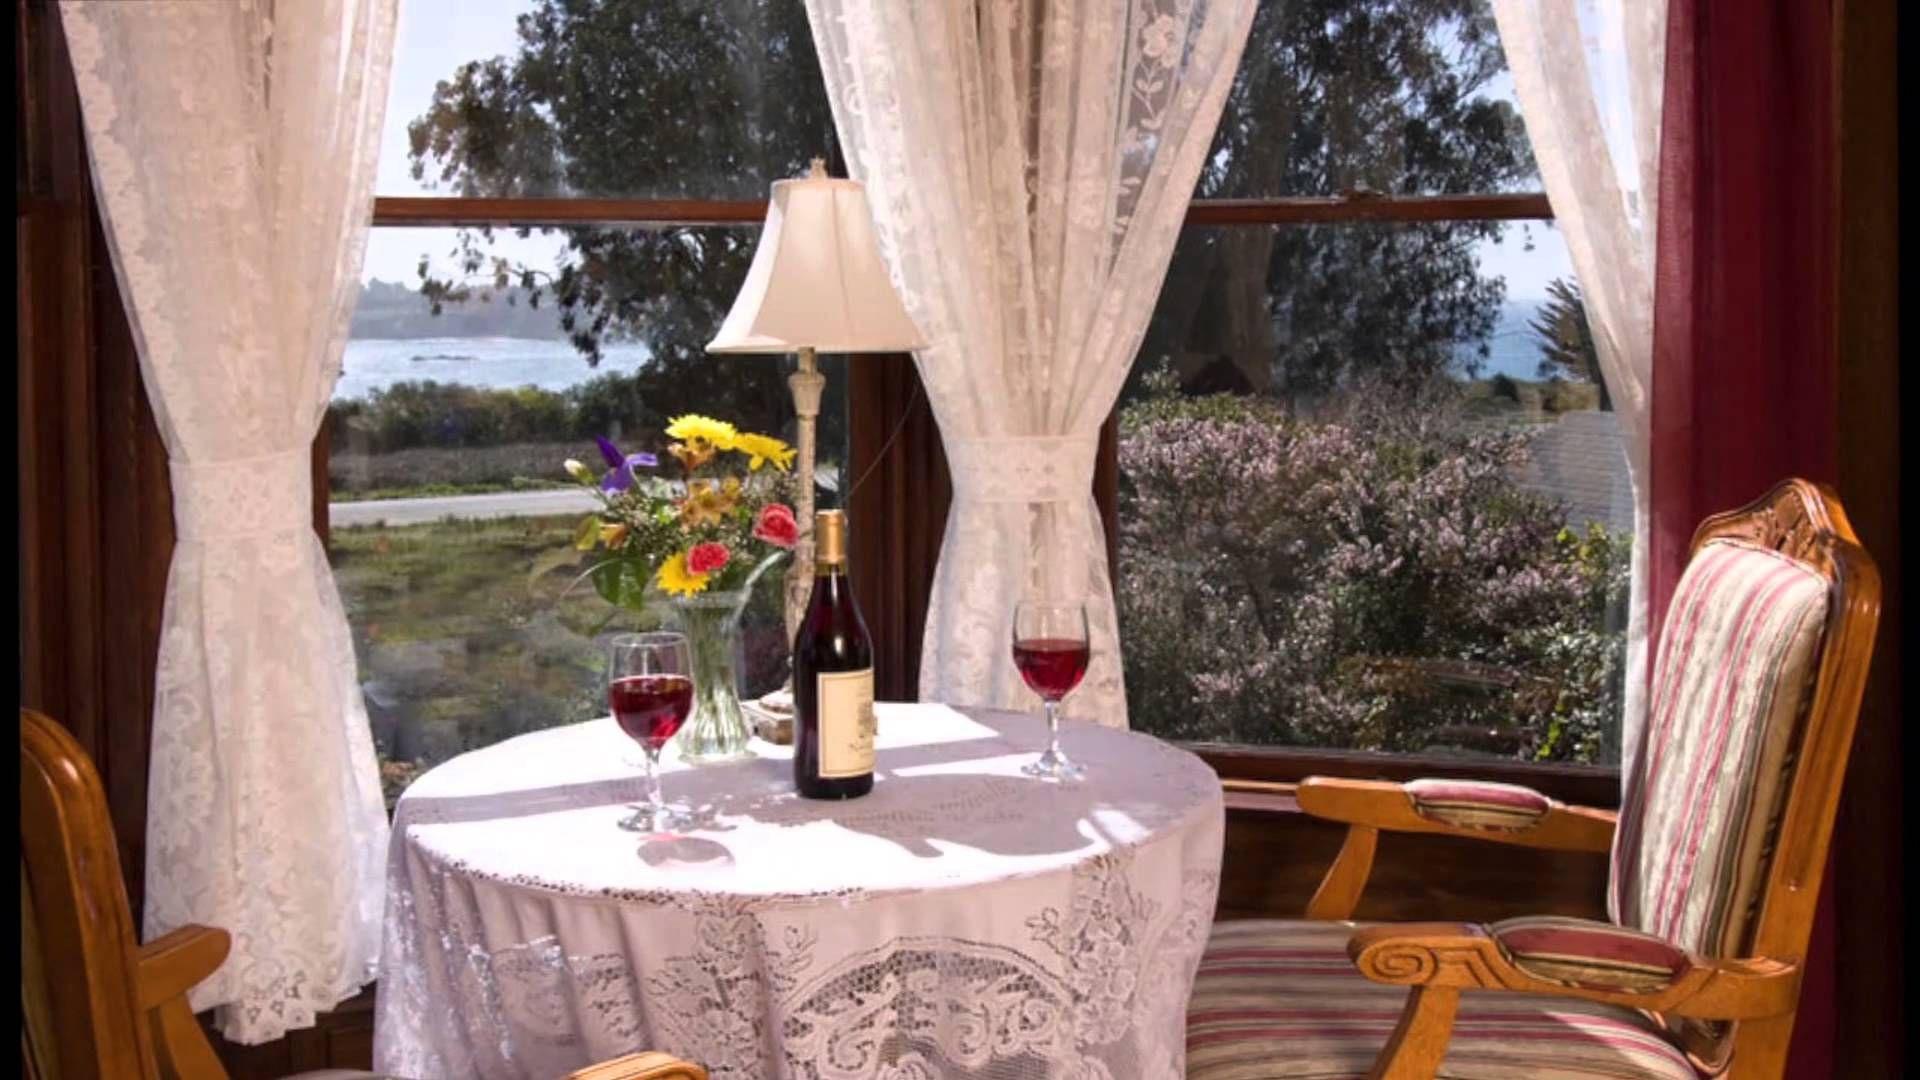 Mendocino CA Bed and Breakfast Inn, Headlands Inn Bed